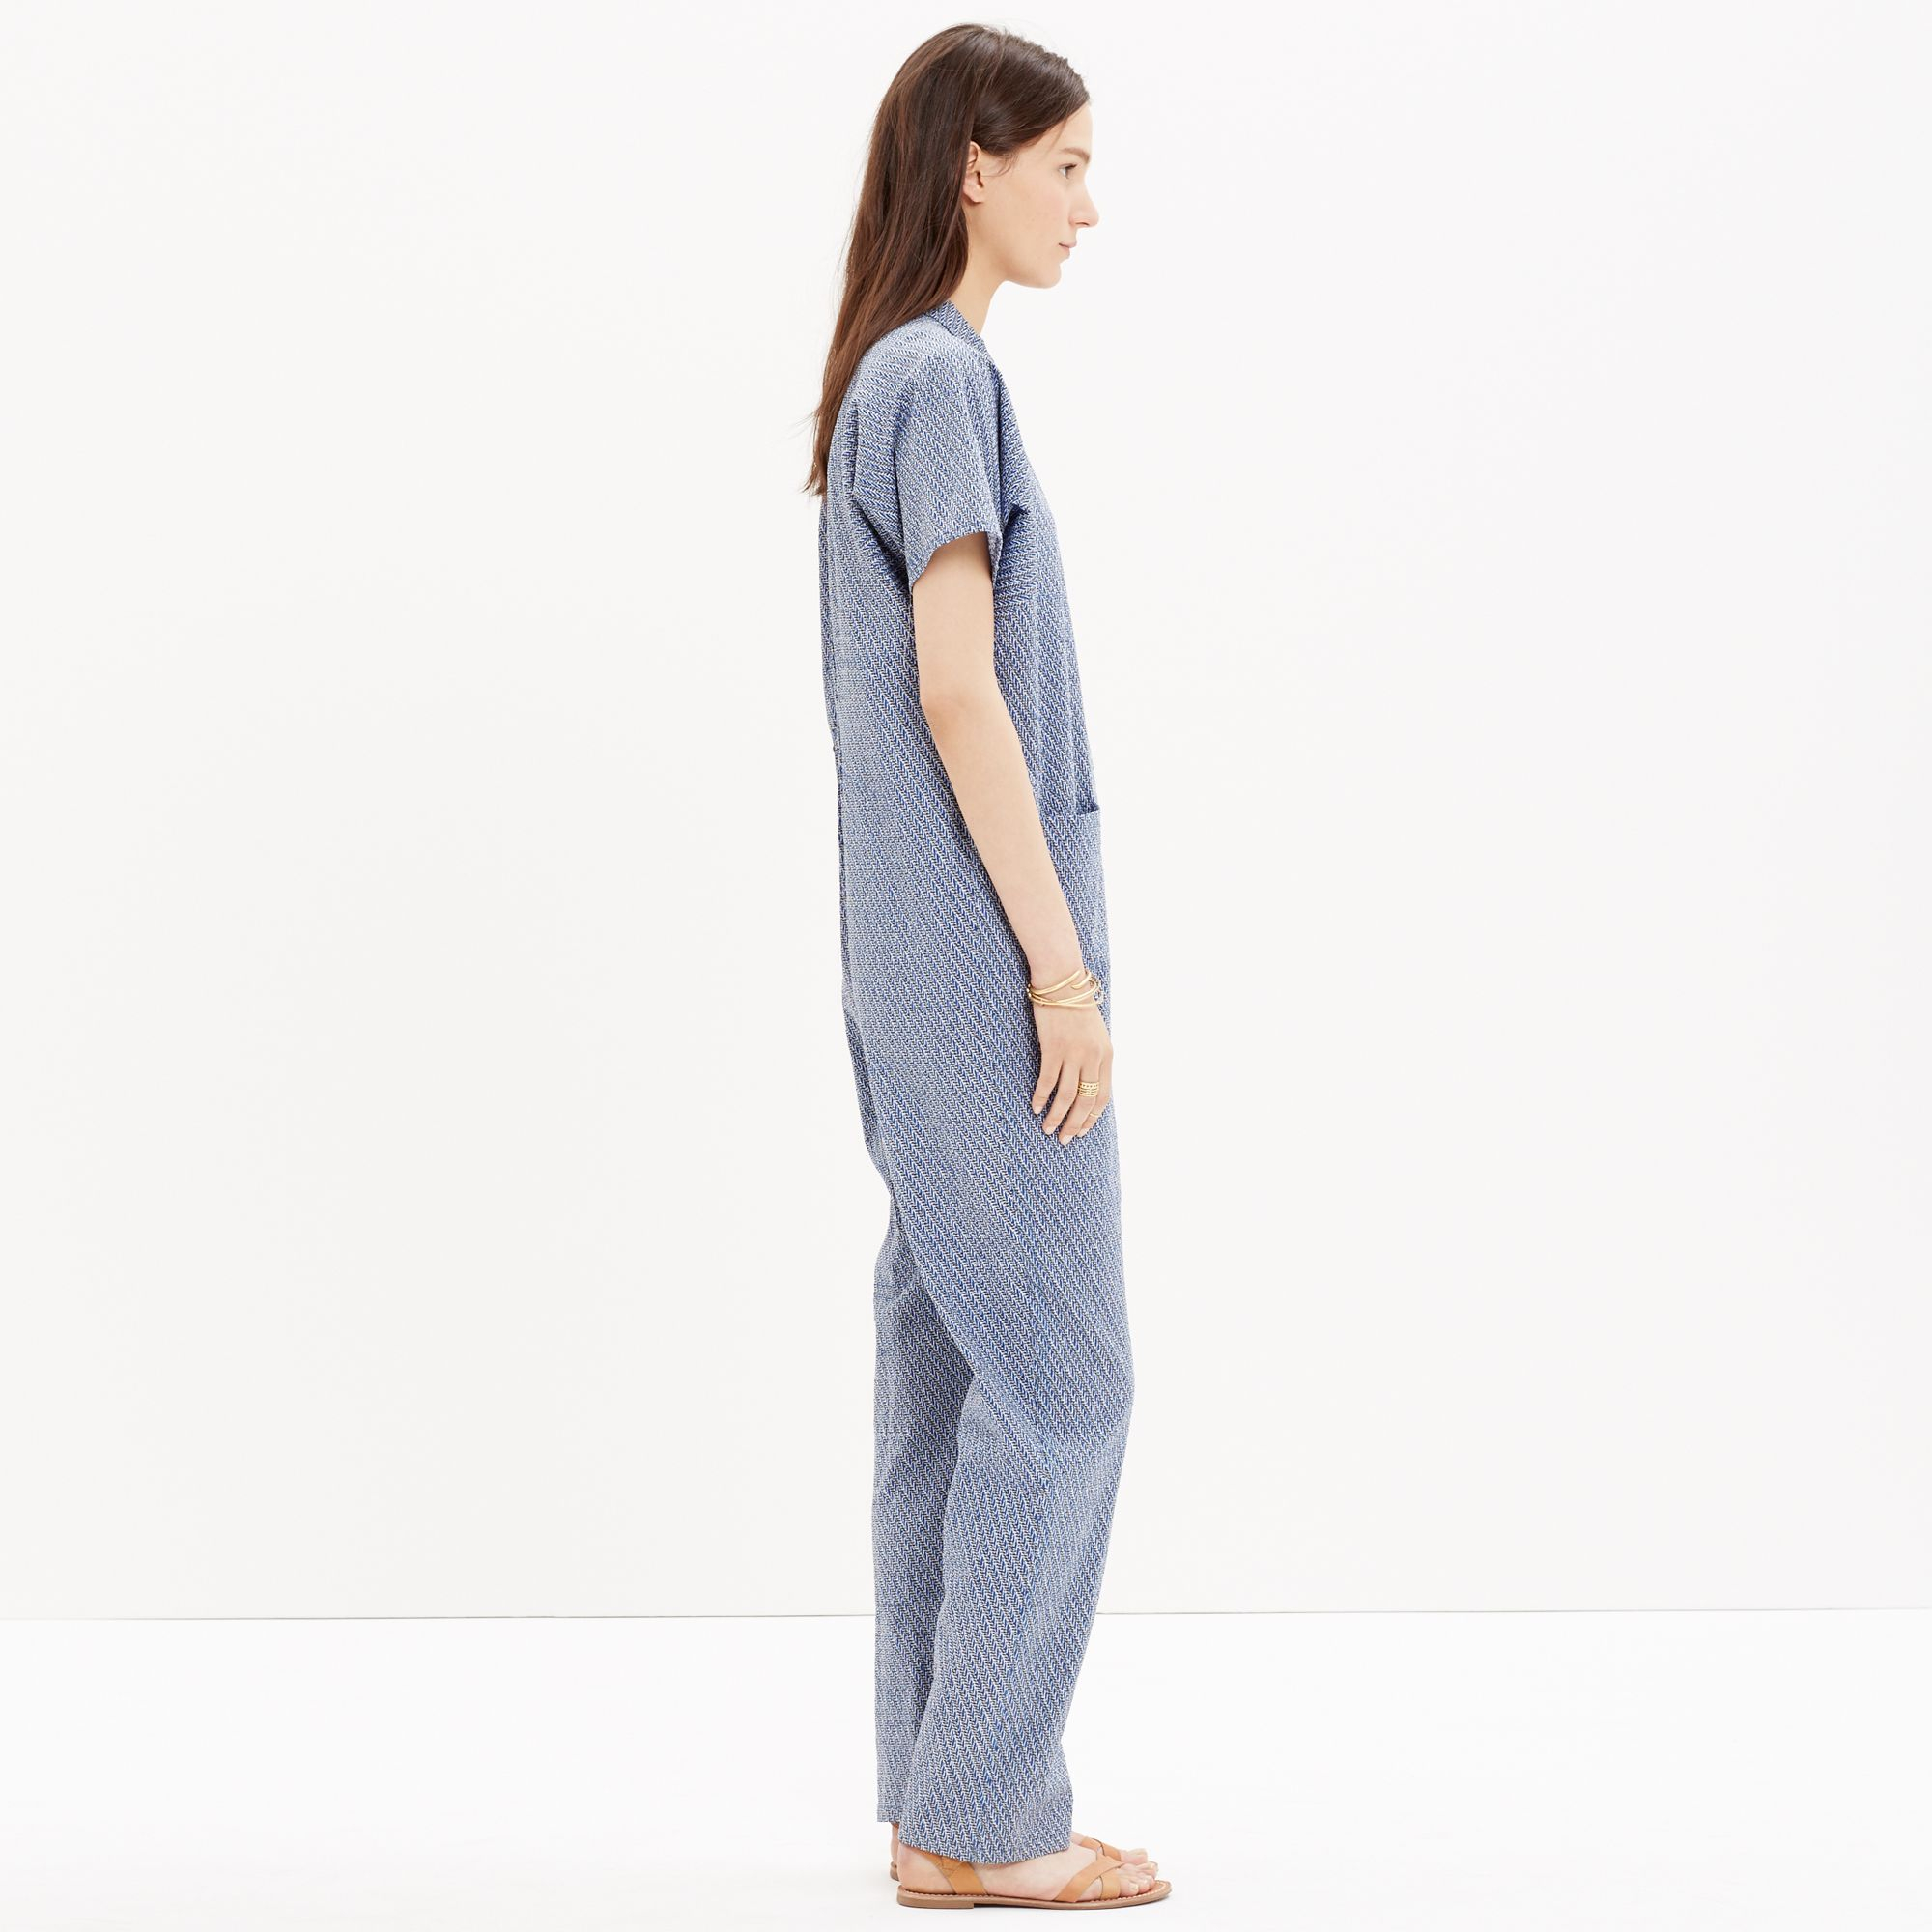 62ffd49420b8 Lyst - Madewell Rachel Comey Barrie Jumpsuit in Blue